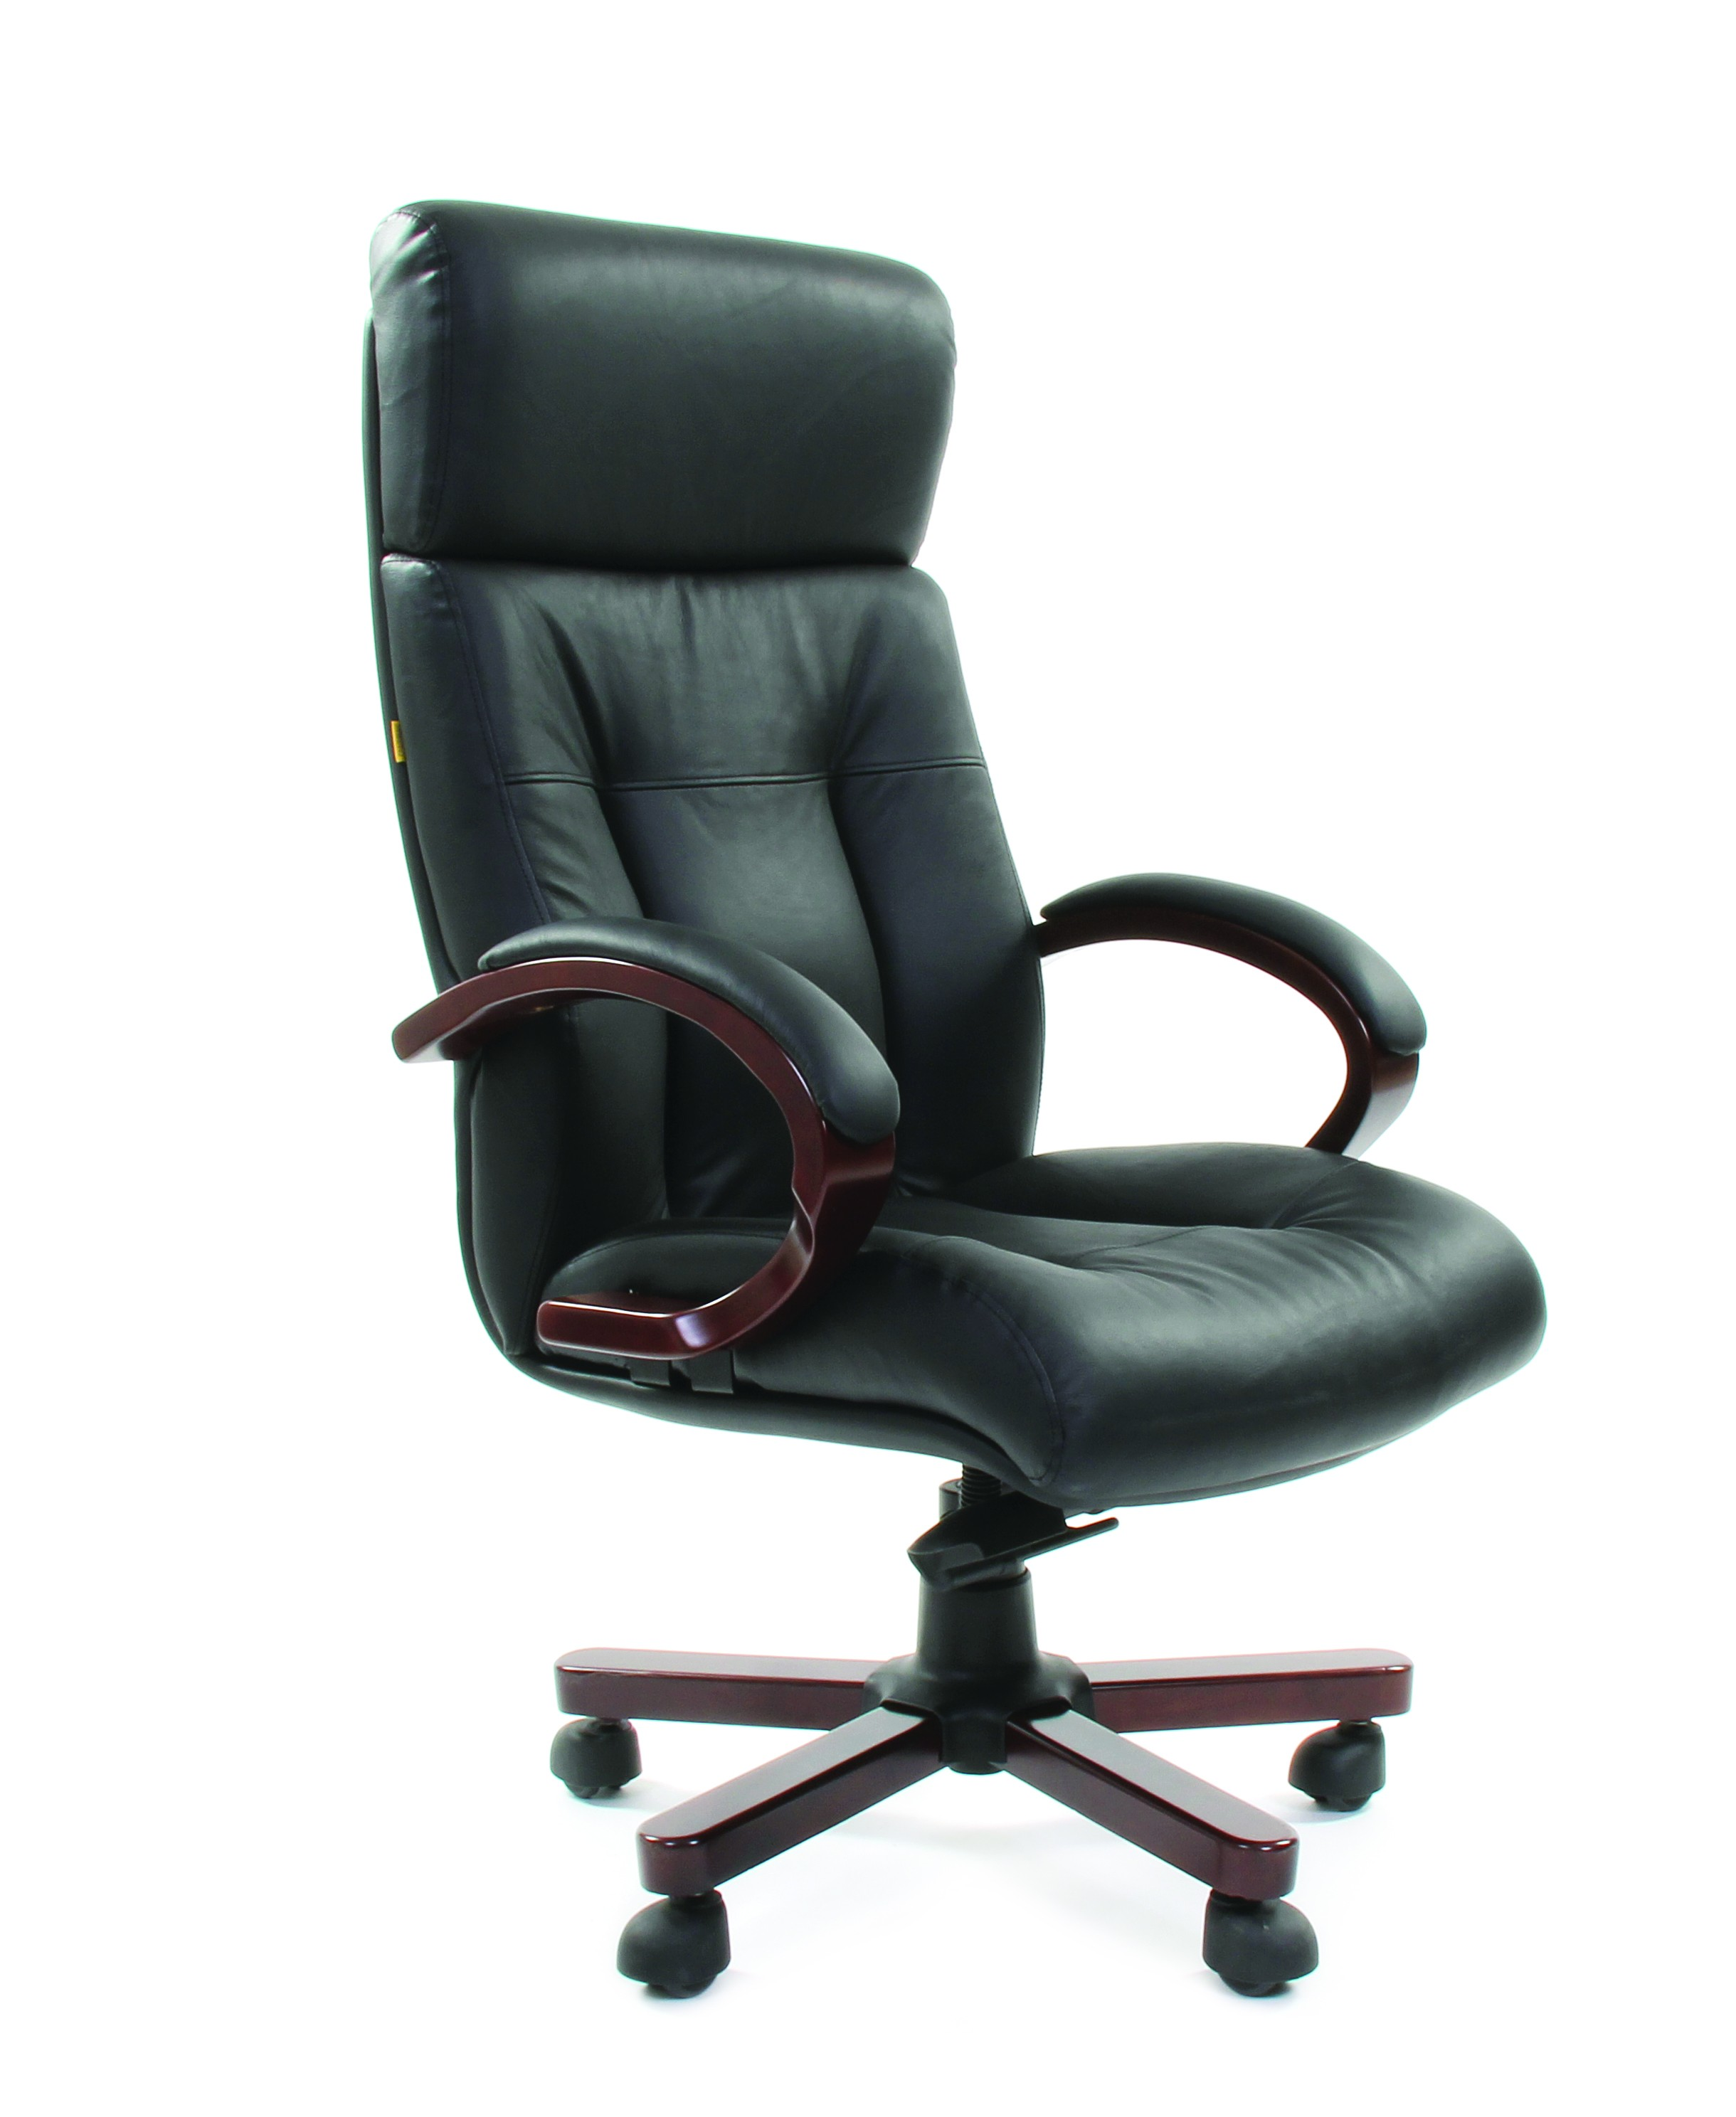 Biroja krēsls Chairman 421